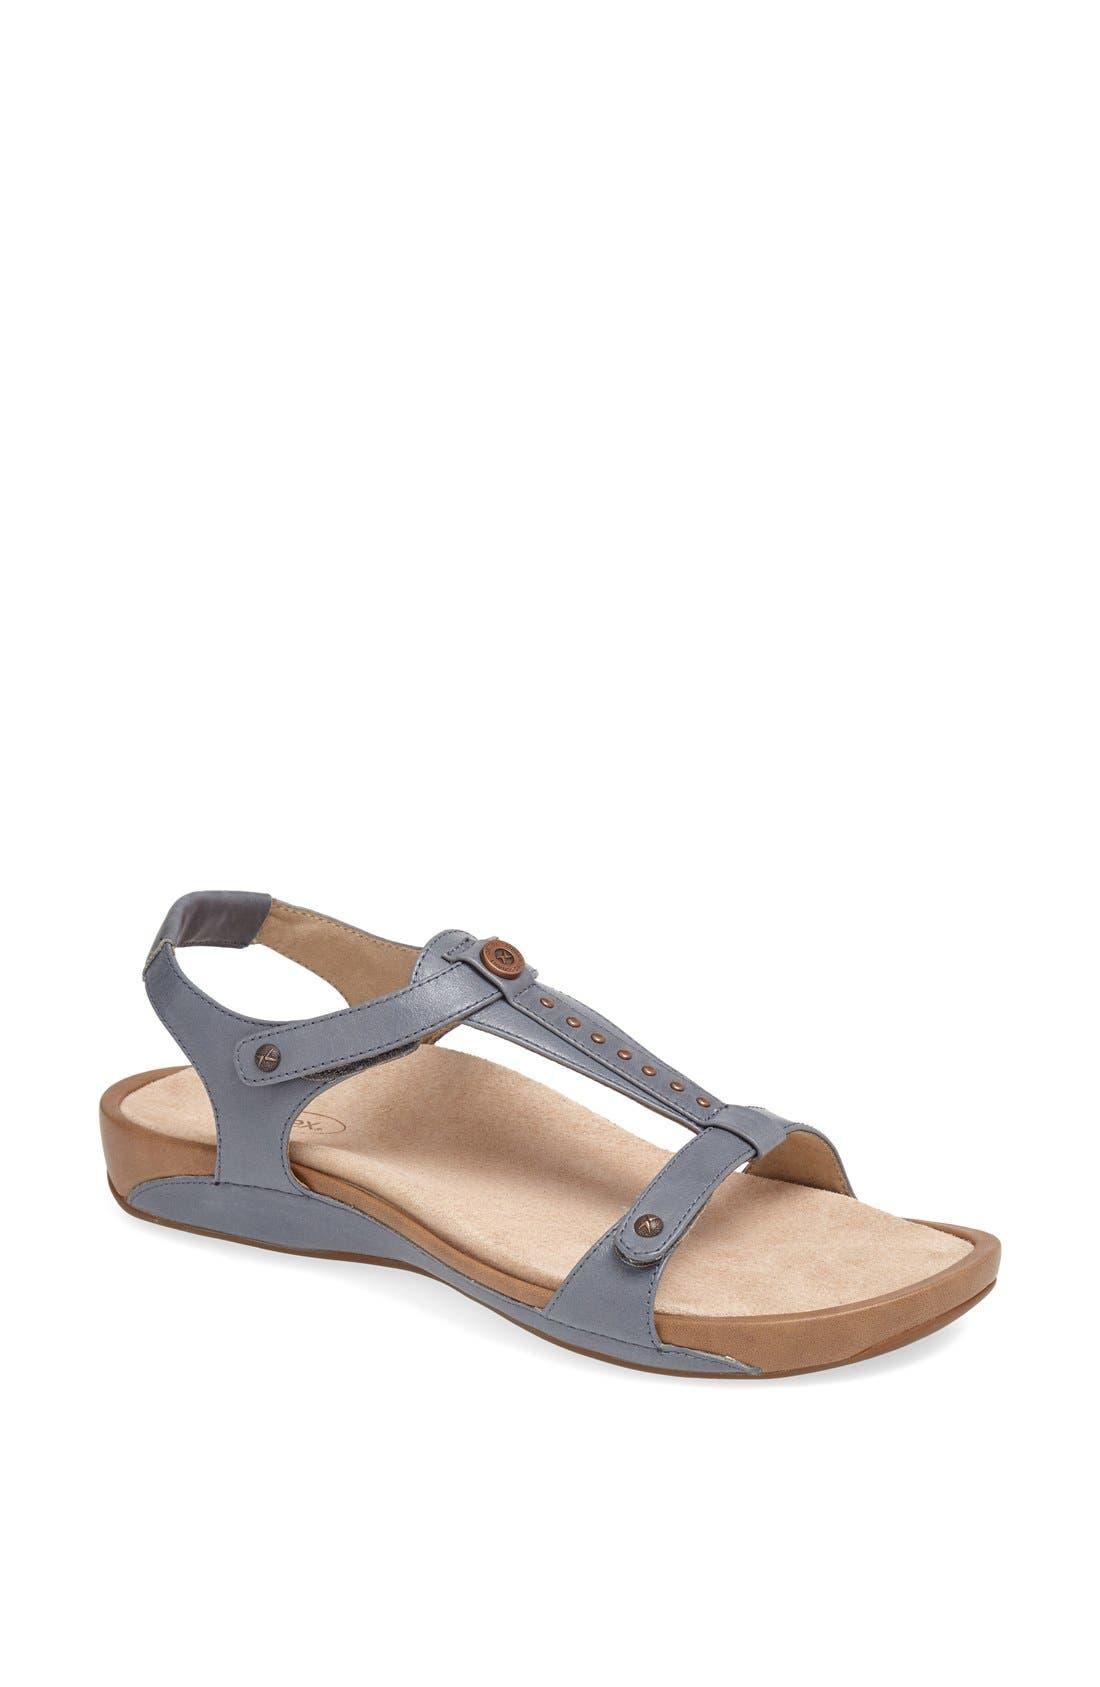 Alternate Image 1 Selected - Aetrex 'Alyssa' Leather Sandal